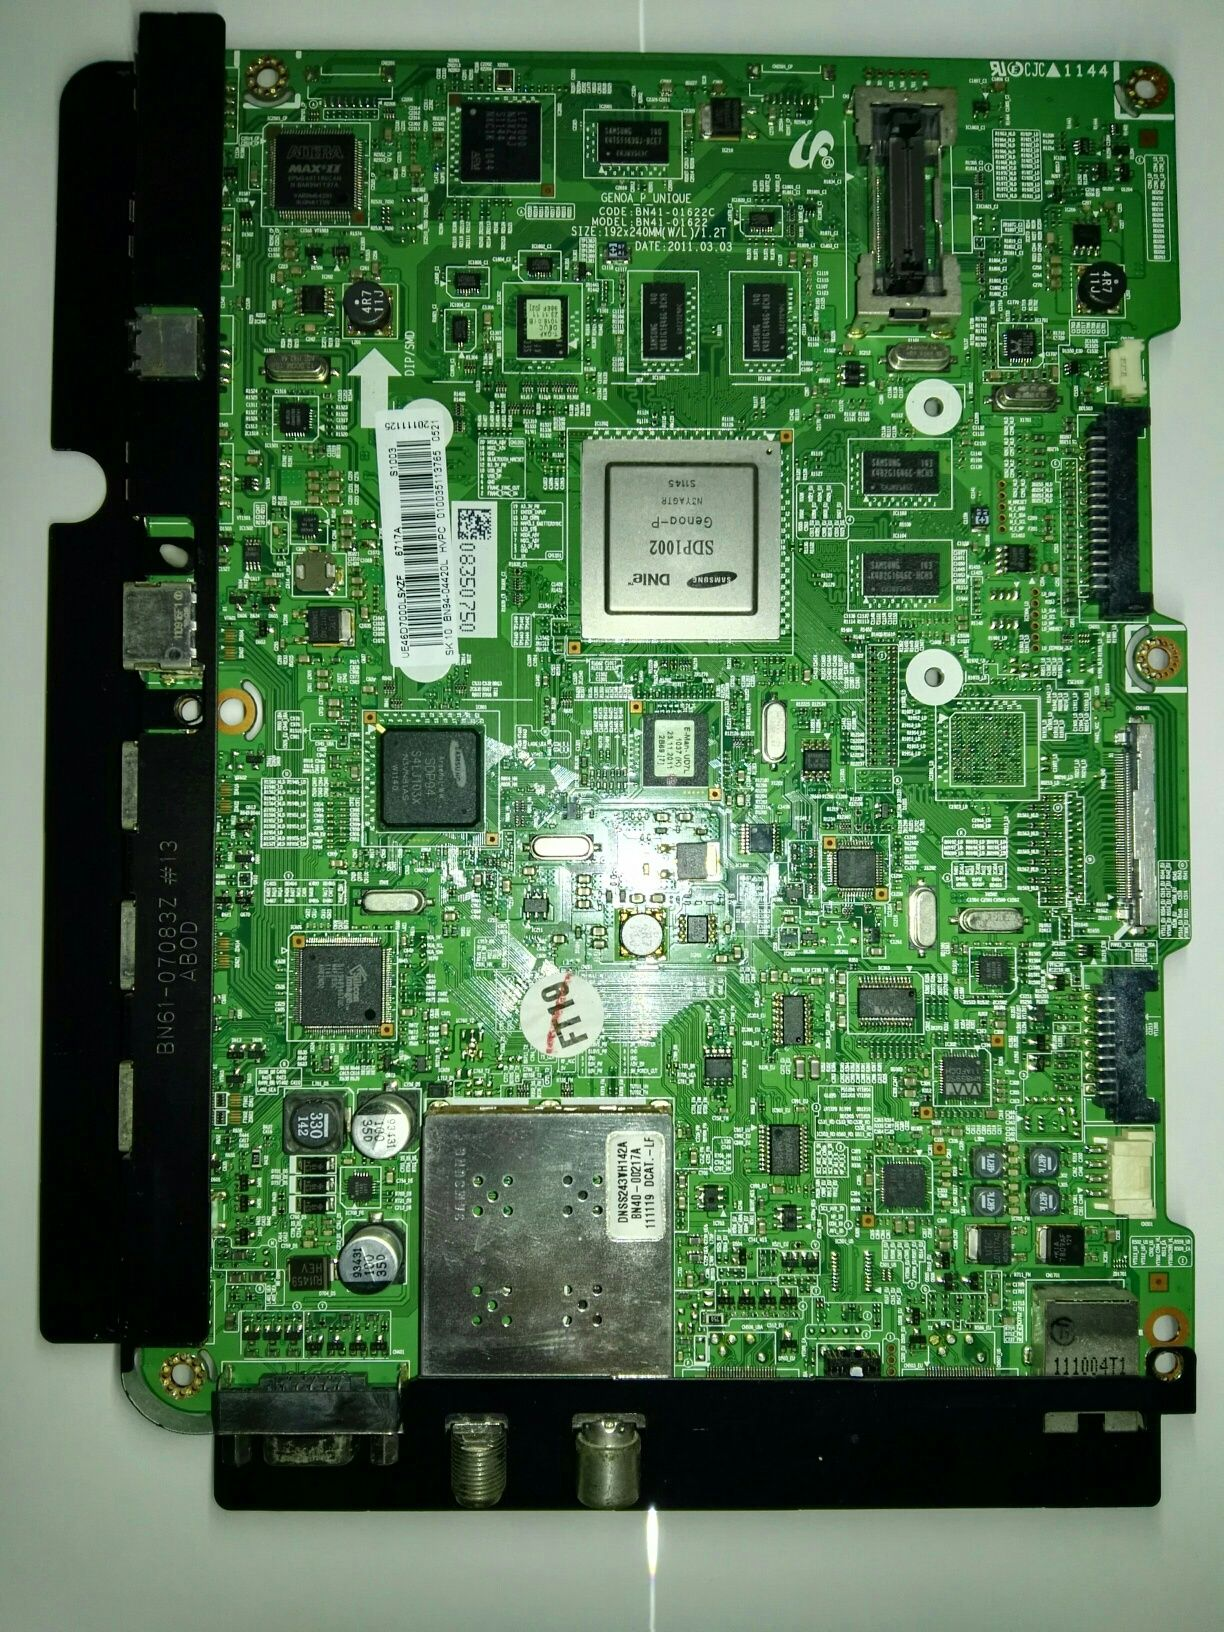 Mainboard smart tv Samsung ue 4 6 d 7 0 0 0 bn94 - 0 4 4 2 0